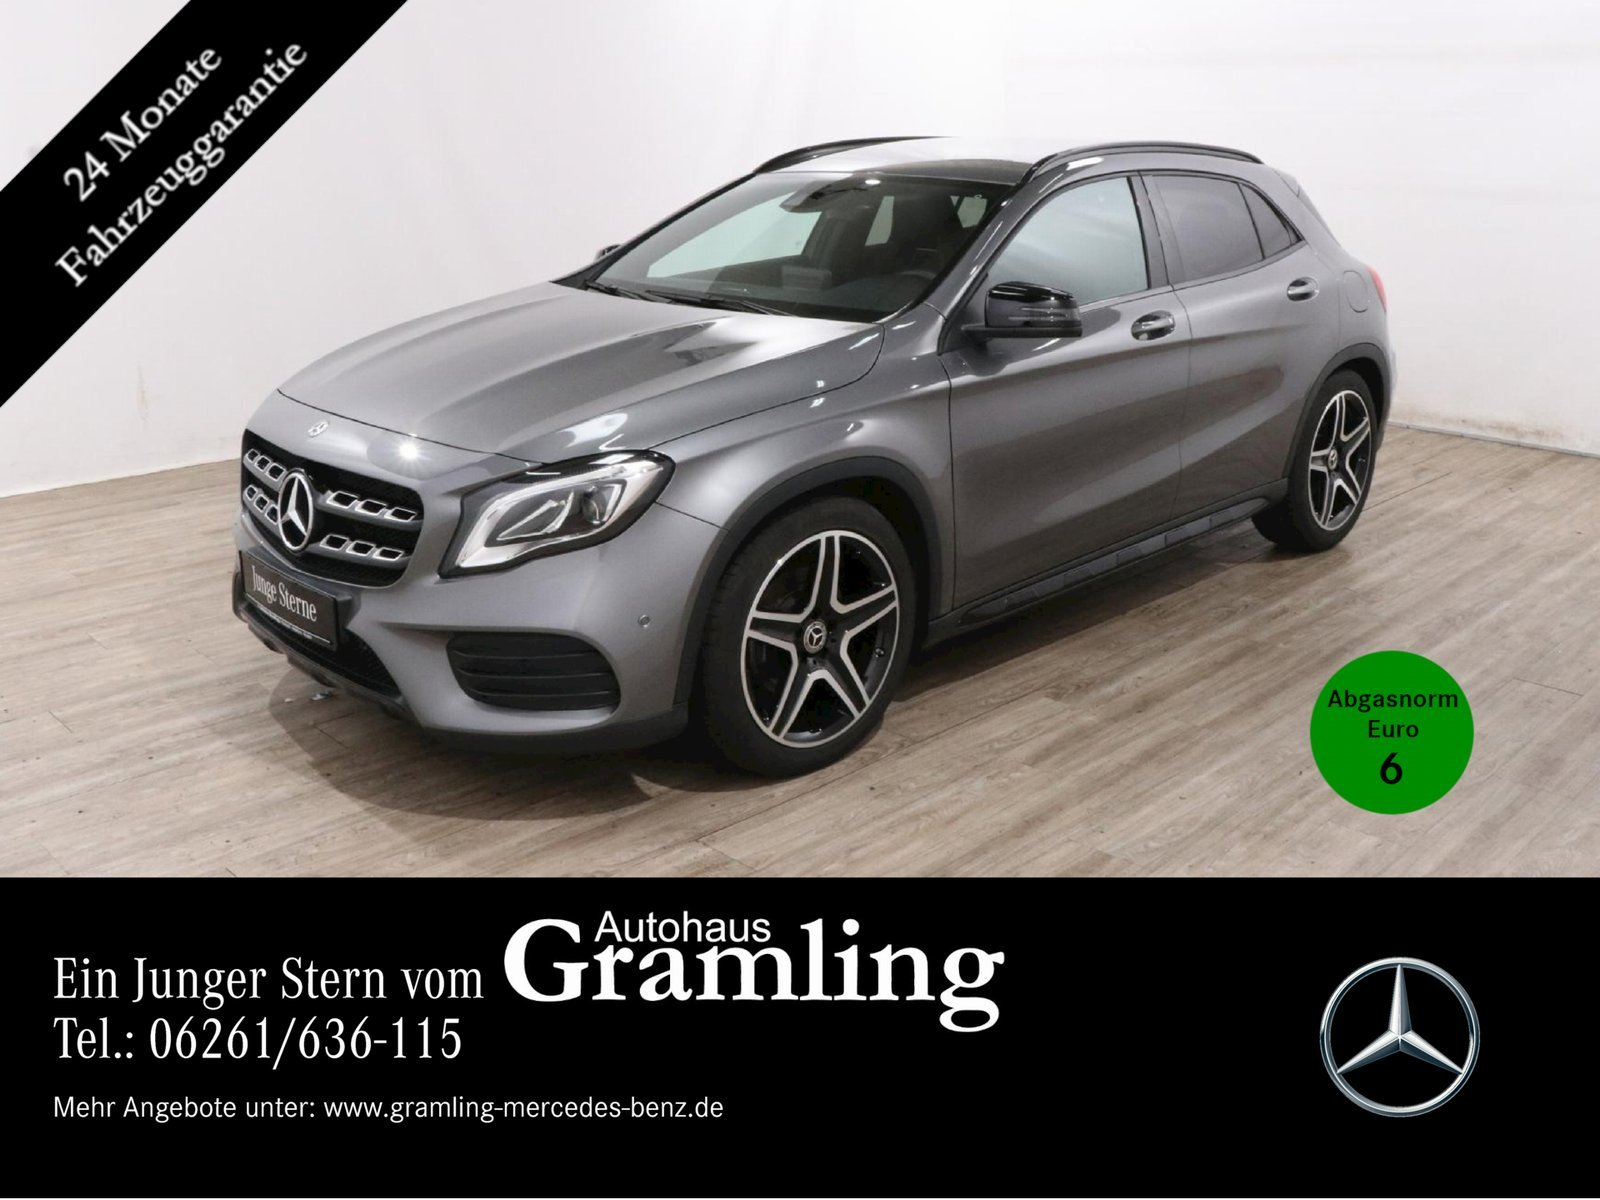 Mercedes-Benz GLA 250 AMG *NIGHT*Kamera*LED*Navi*AHK*Memory*, Jahr 2019, Benzin